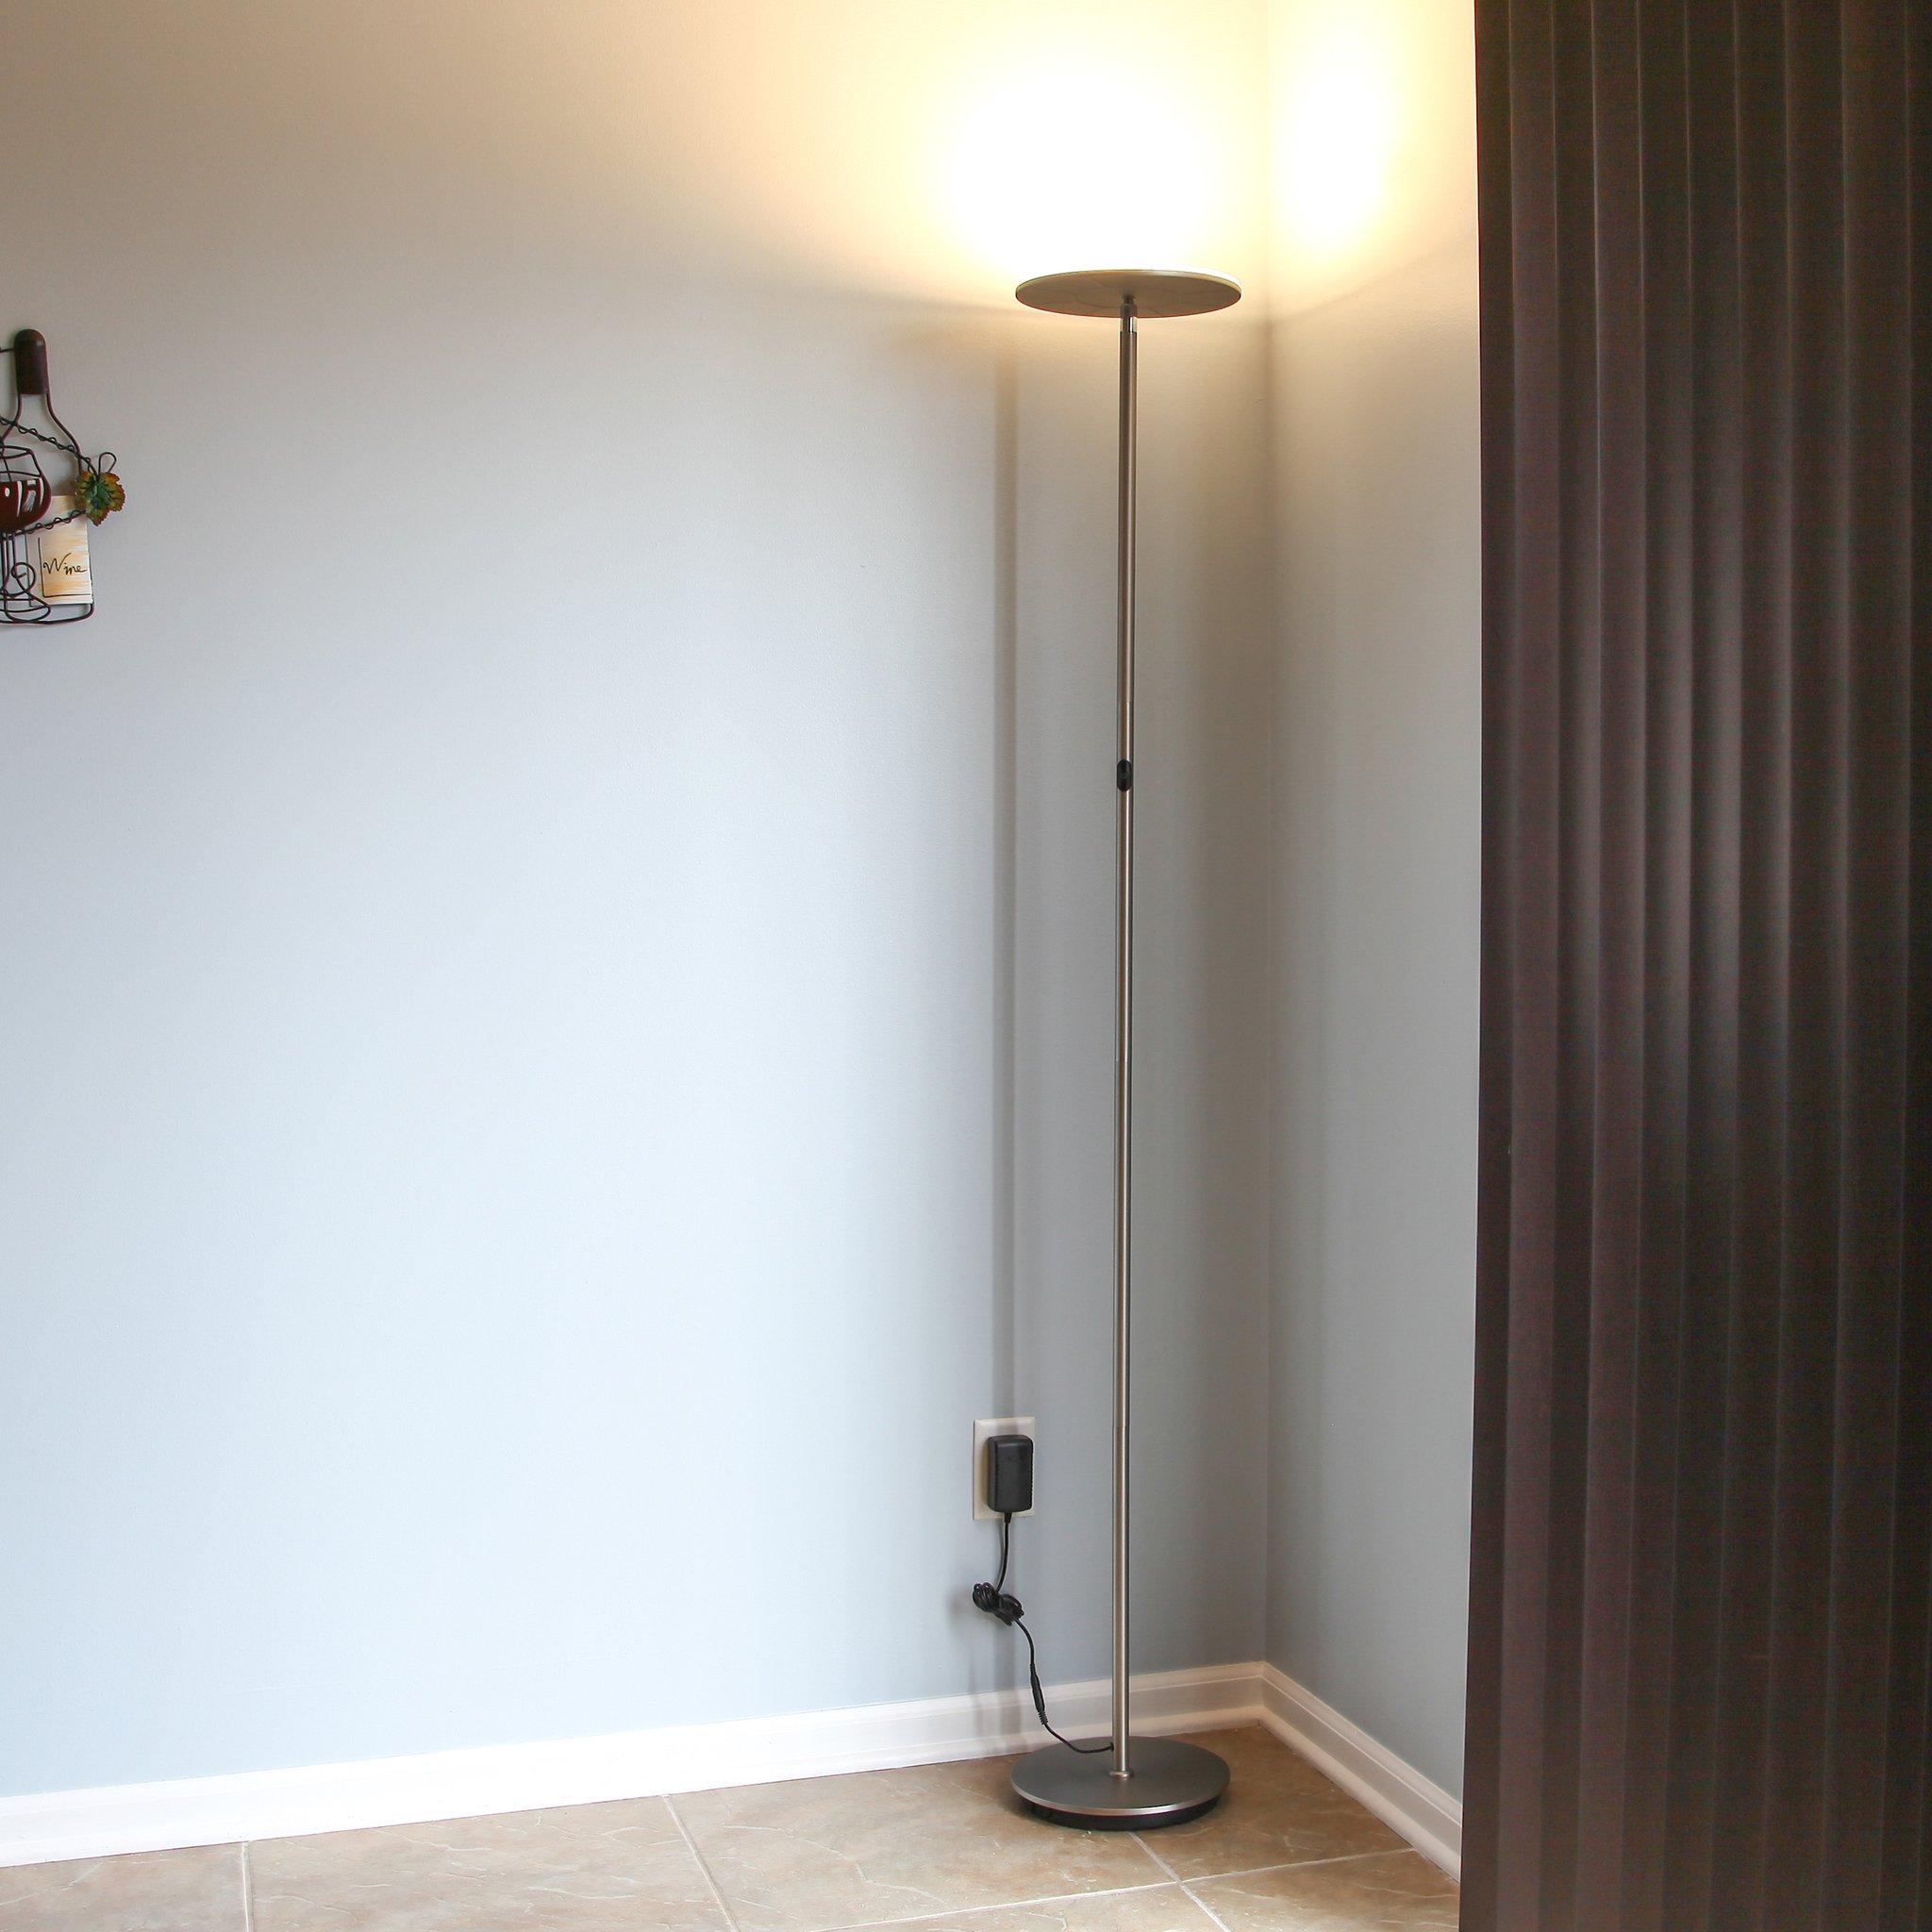 Best Bedside Lamps For Reading: Comparison Guide